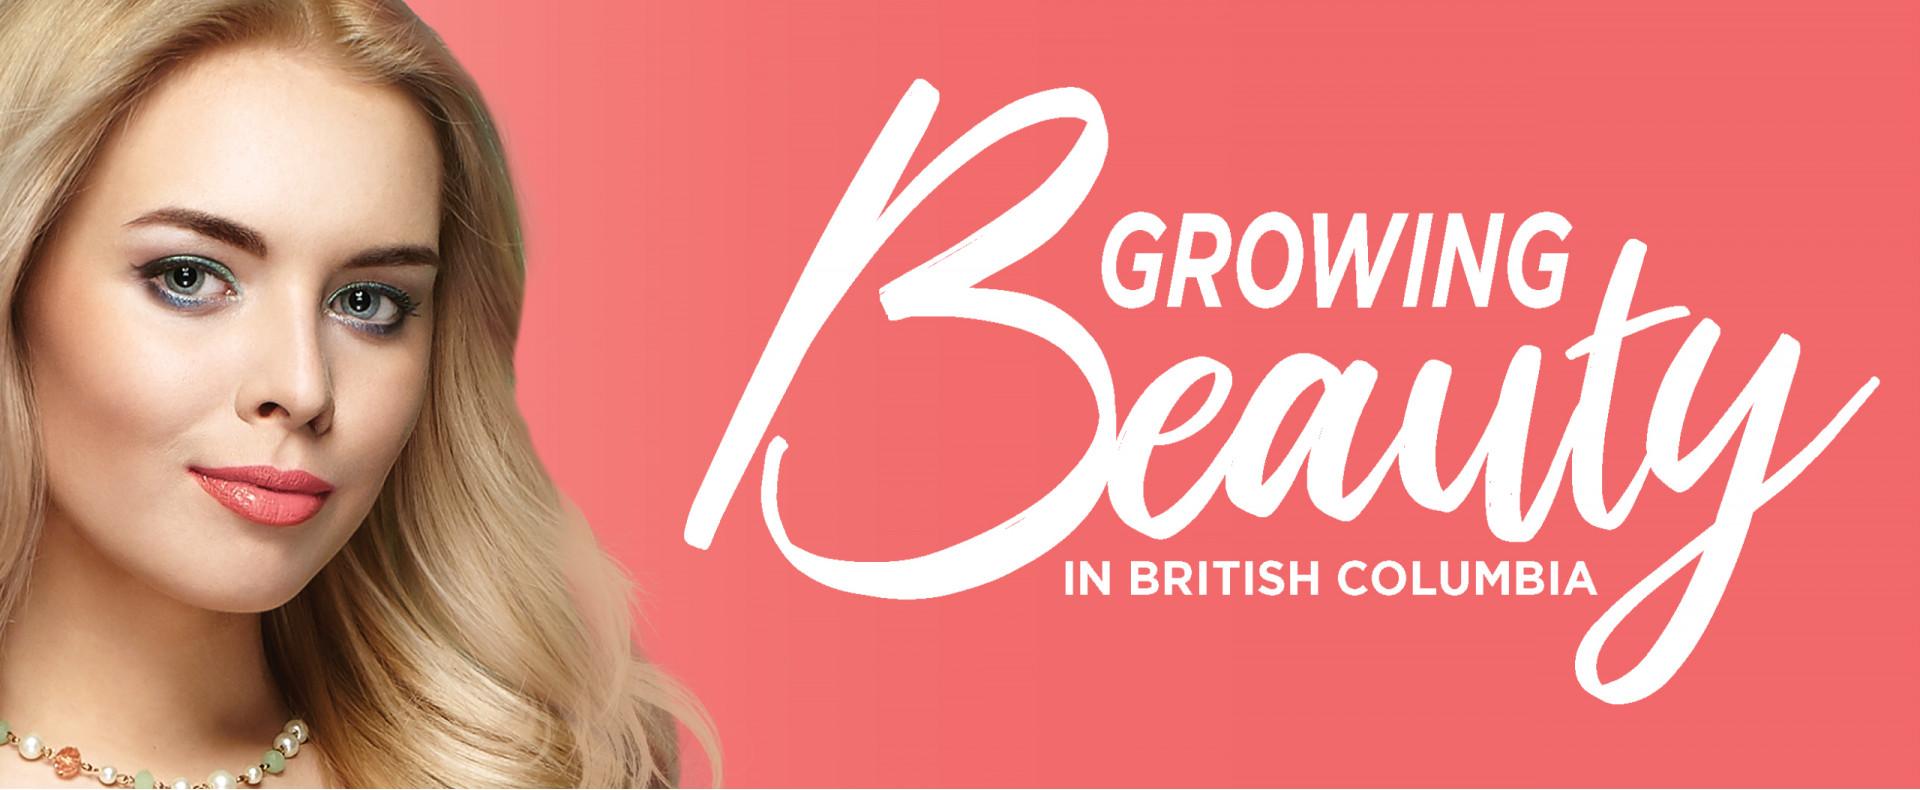 Growing Beauty in British Columbia